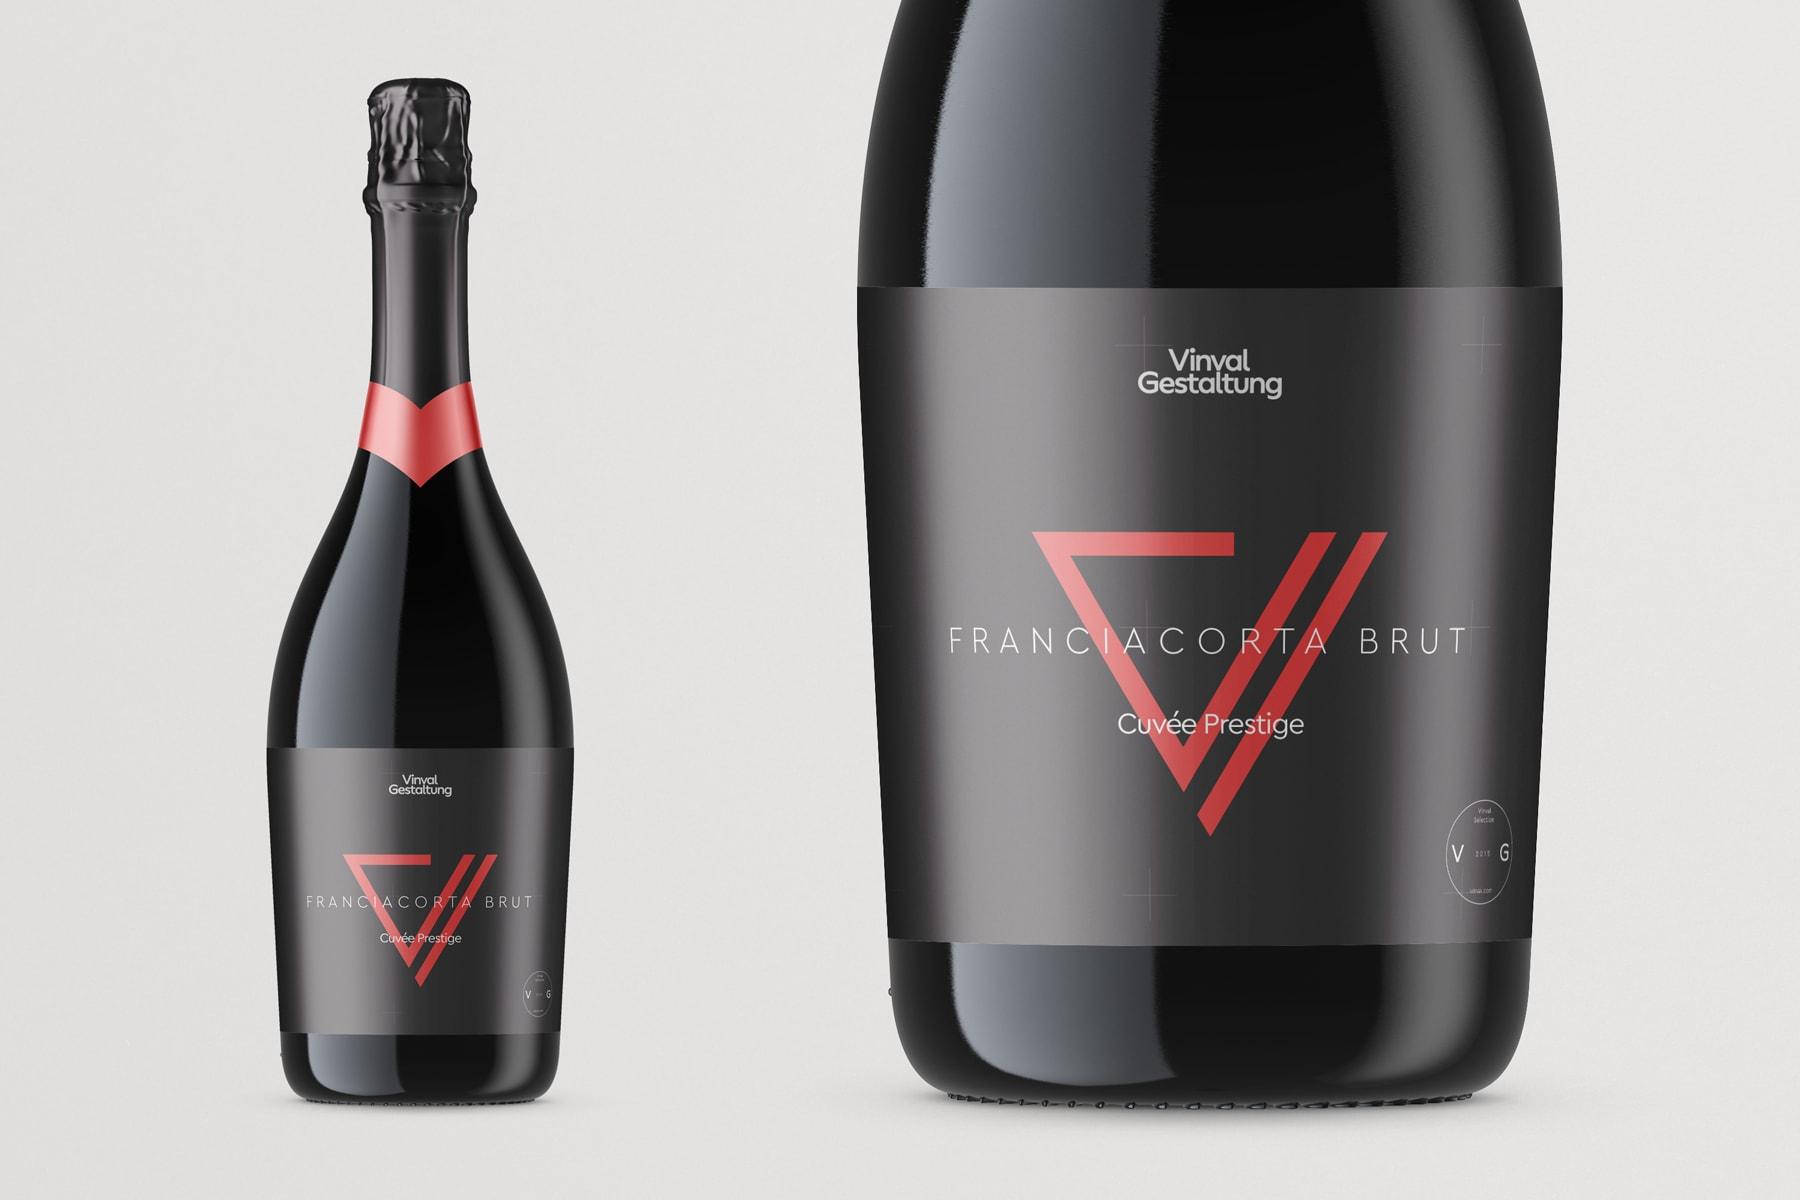 Champagner_flasche_Vinval.jpg